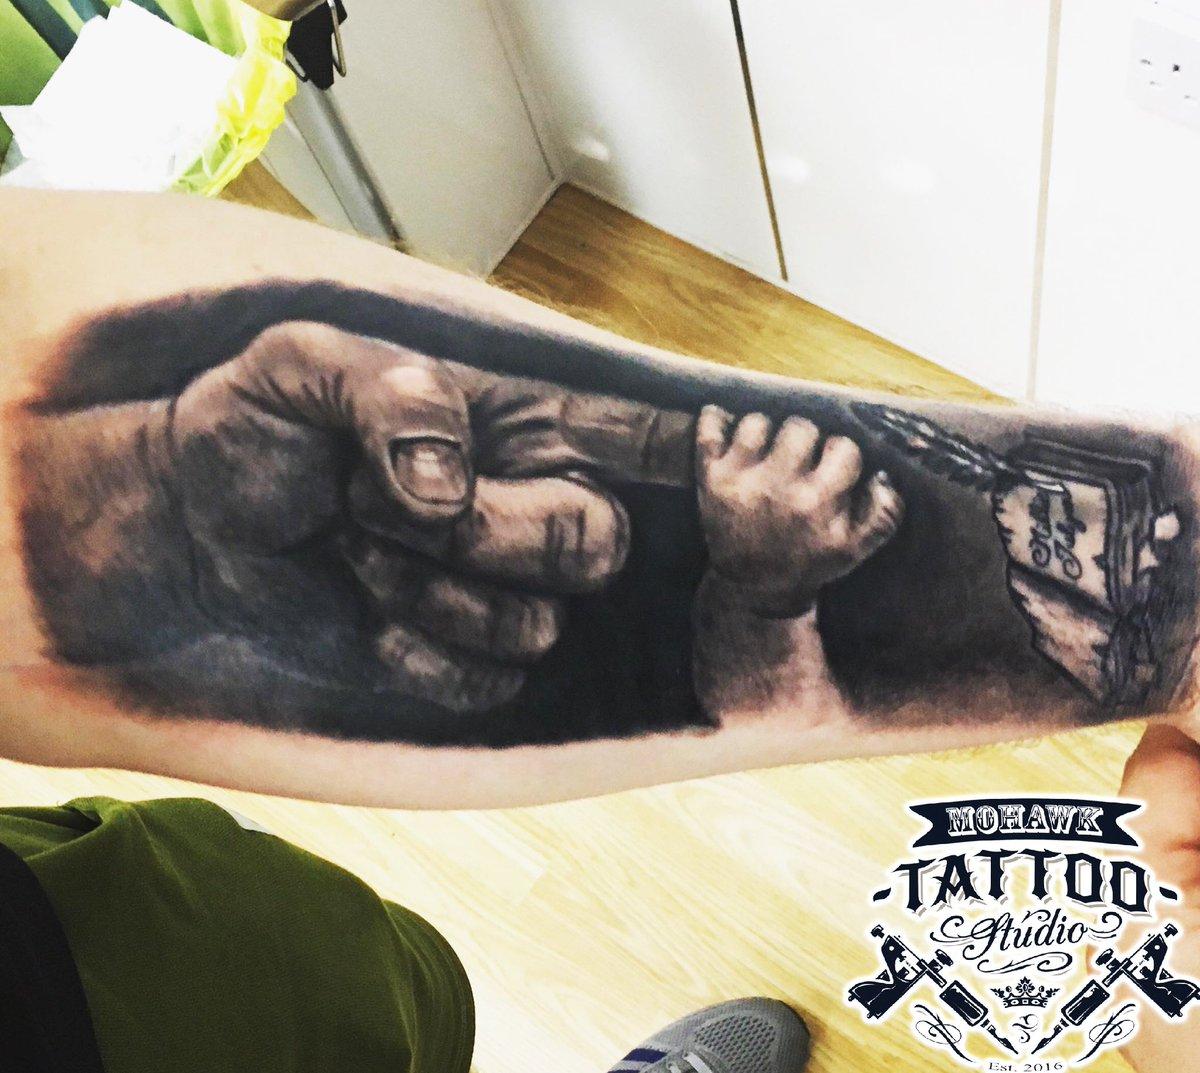 Mohawk Tattoo Studio On Twitter Amazing Idea Of Father And